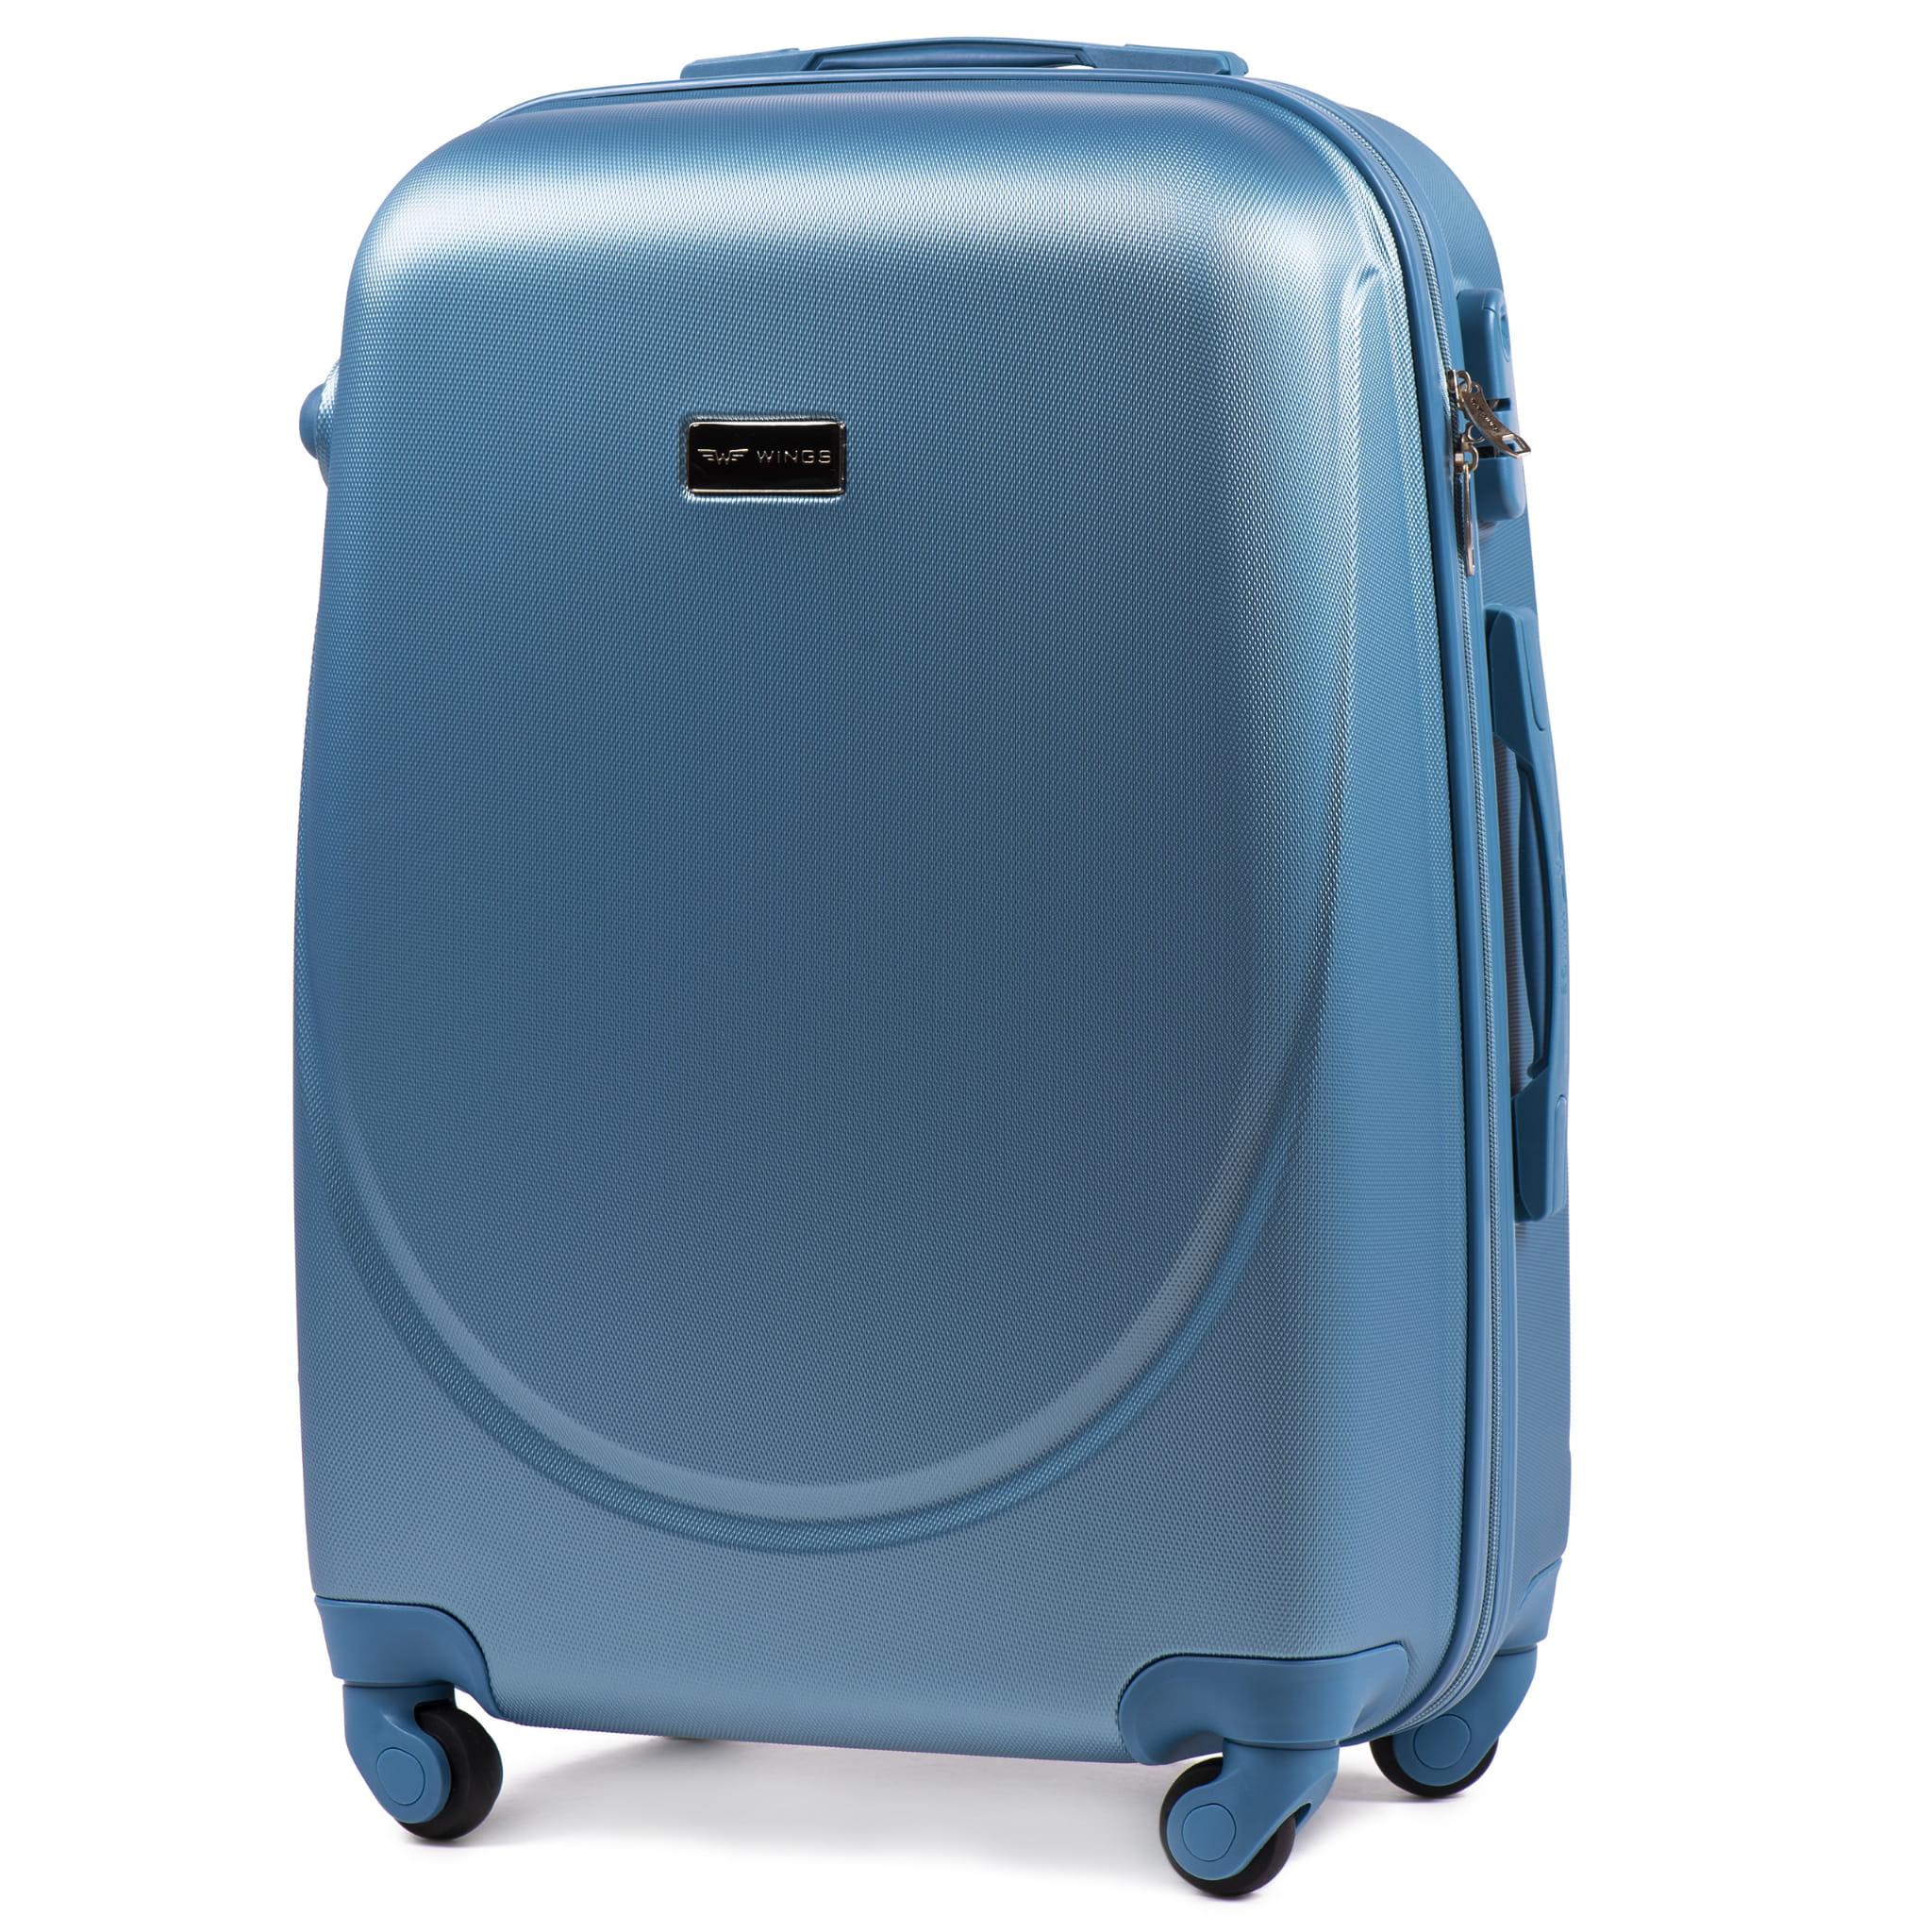 Большой Чемодан Wings 310 L  PREMIUM на 4-х каучуковых колесах!Для багажа ,до 23 кг